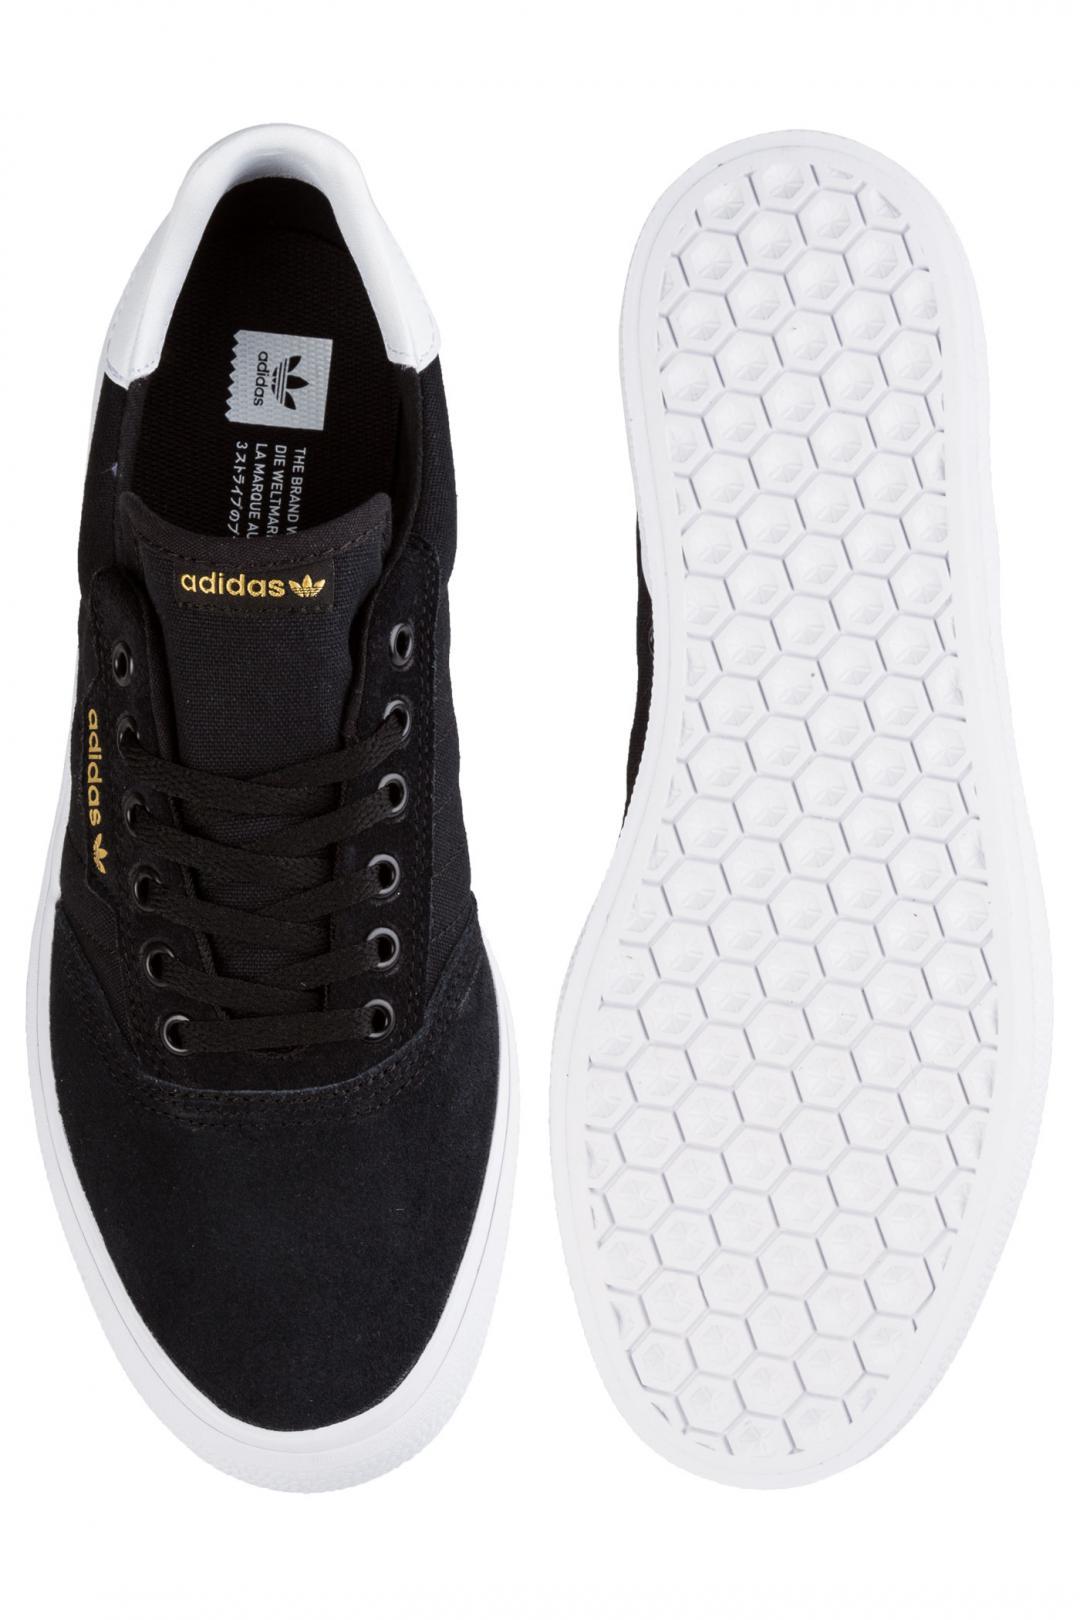 Uomo adidas Skateboarding 3MC Suede core black white   Sneakers low top